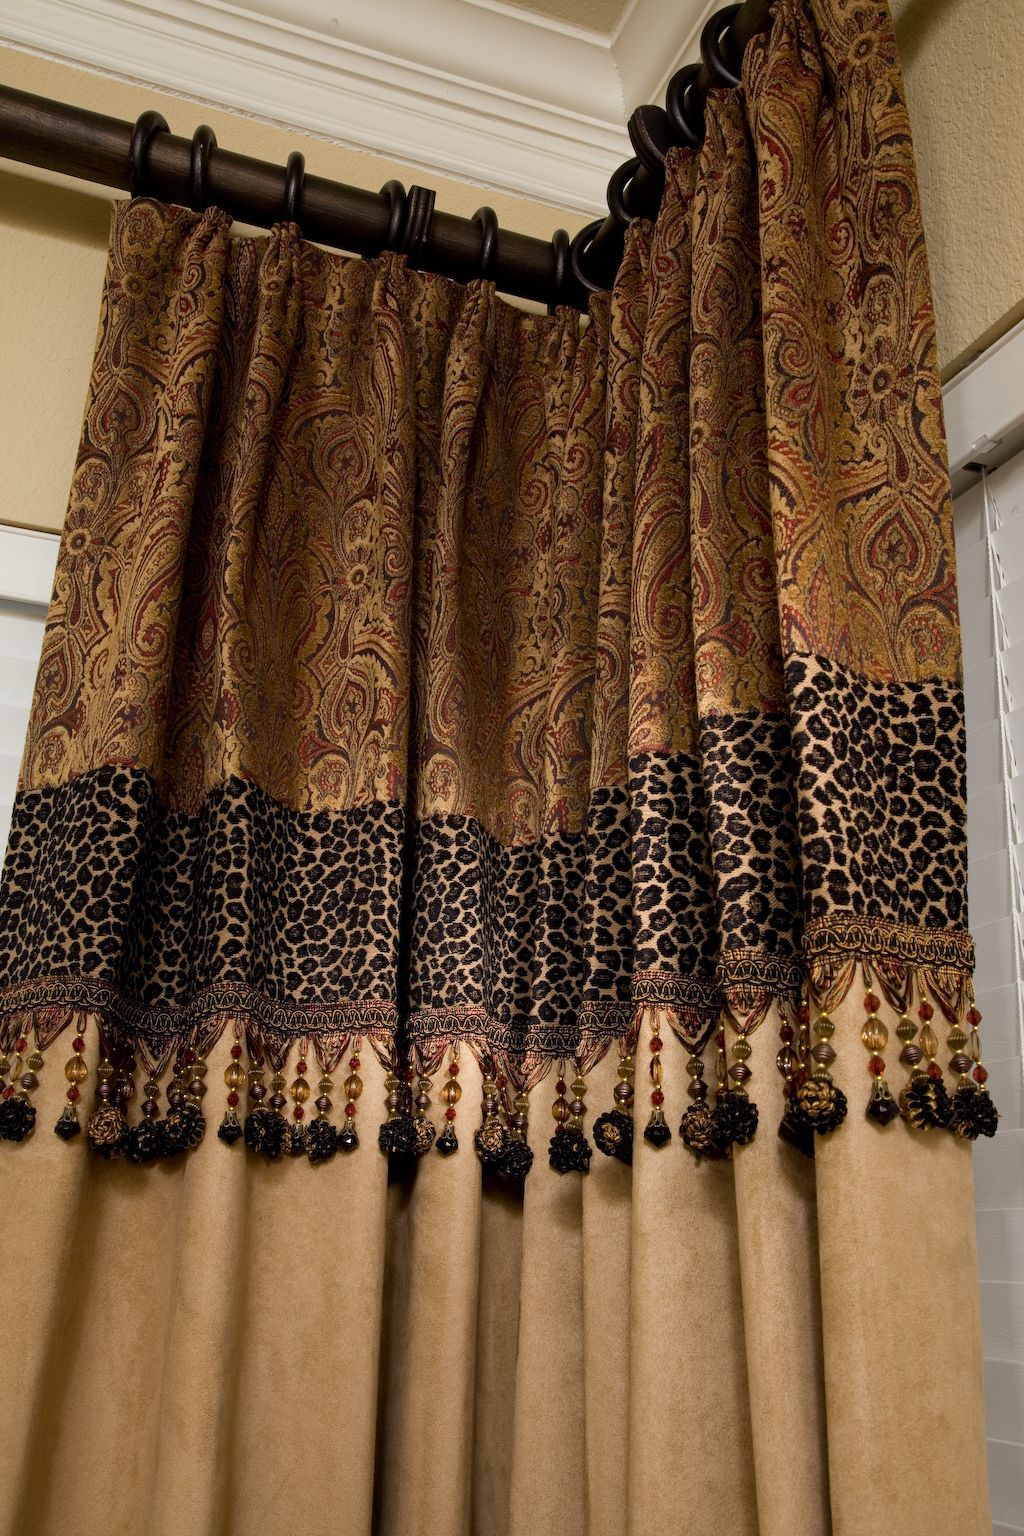 47aa03f4c7429cf468157195c4167862 Jpg 1 024 1 536 Pixels Custom Drapery Window Coverings Window Treatments